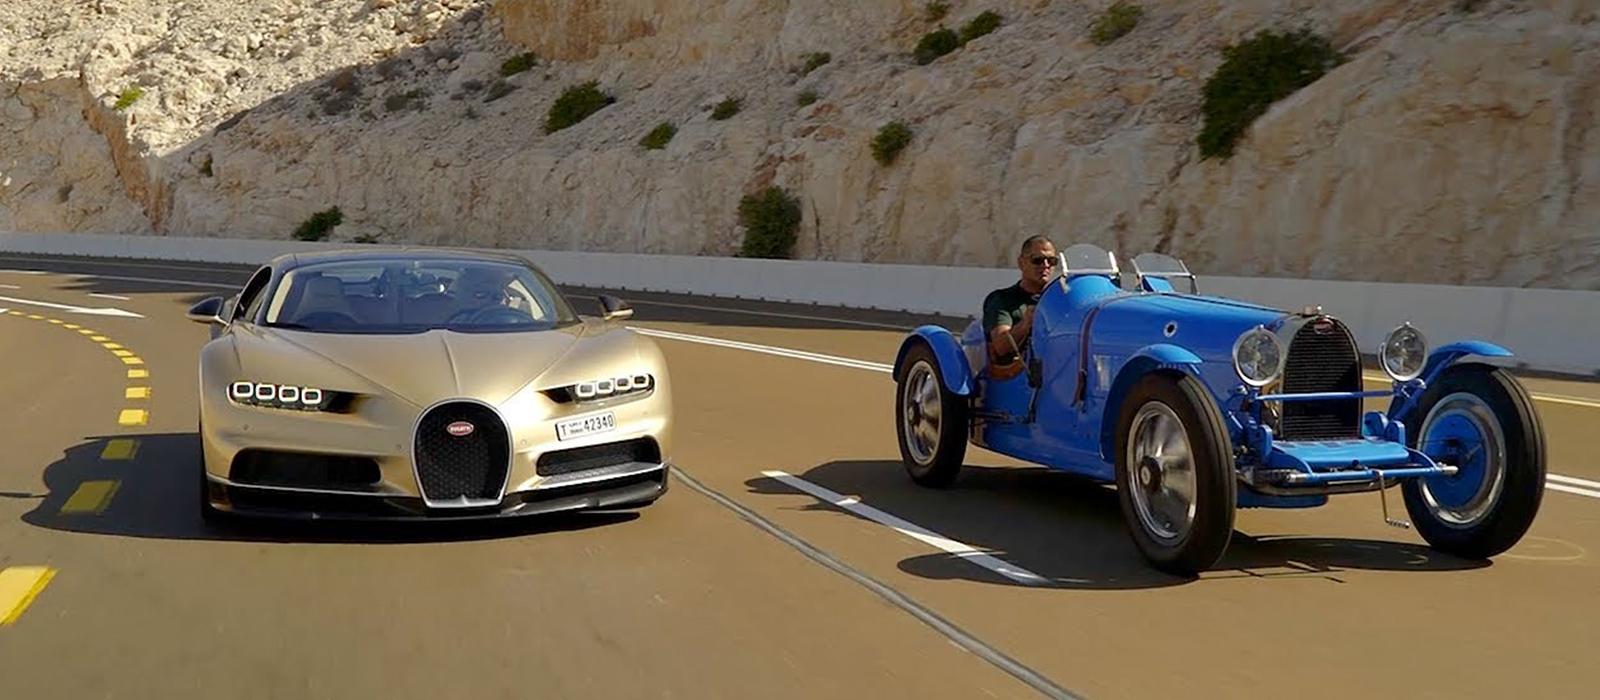 Chris Harris drives the Pur Sang Bugatti Type 35